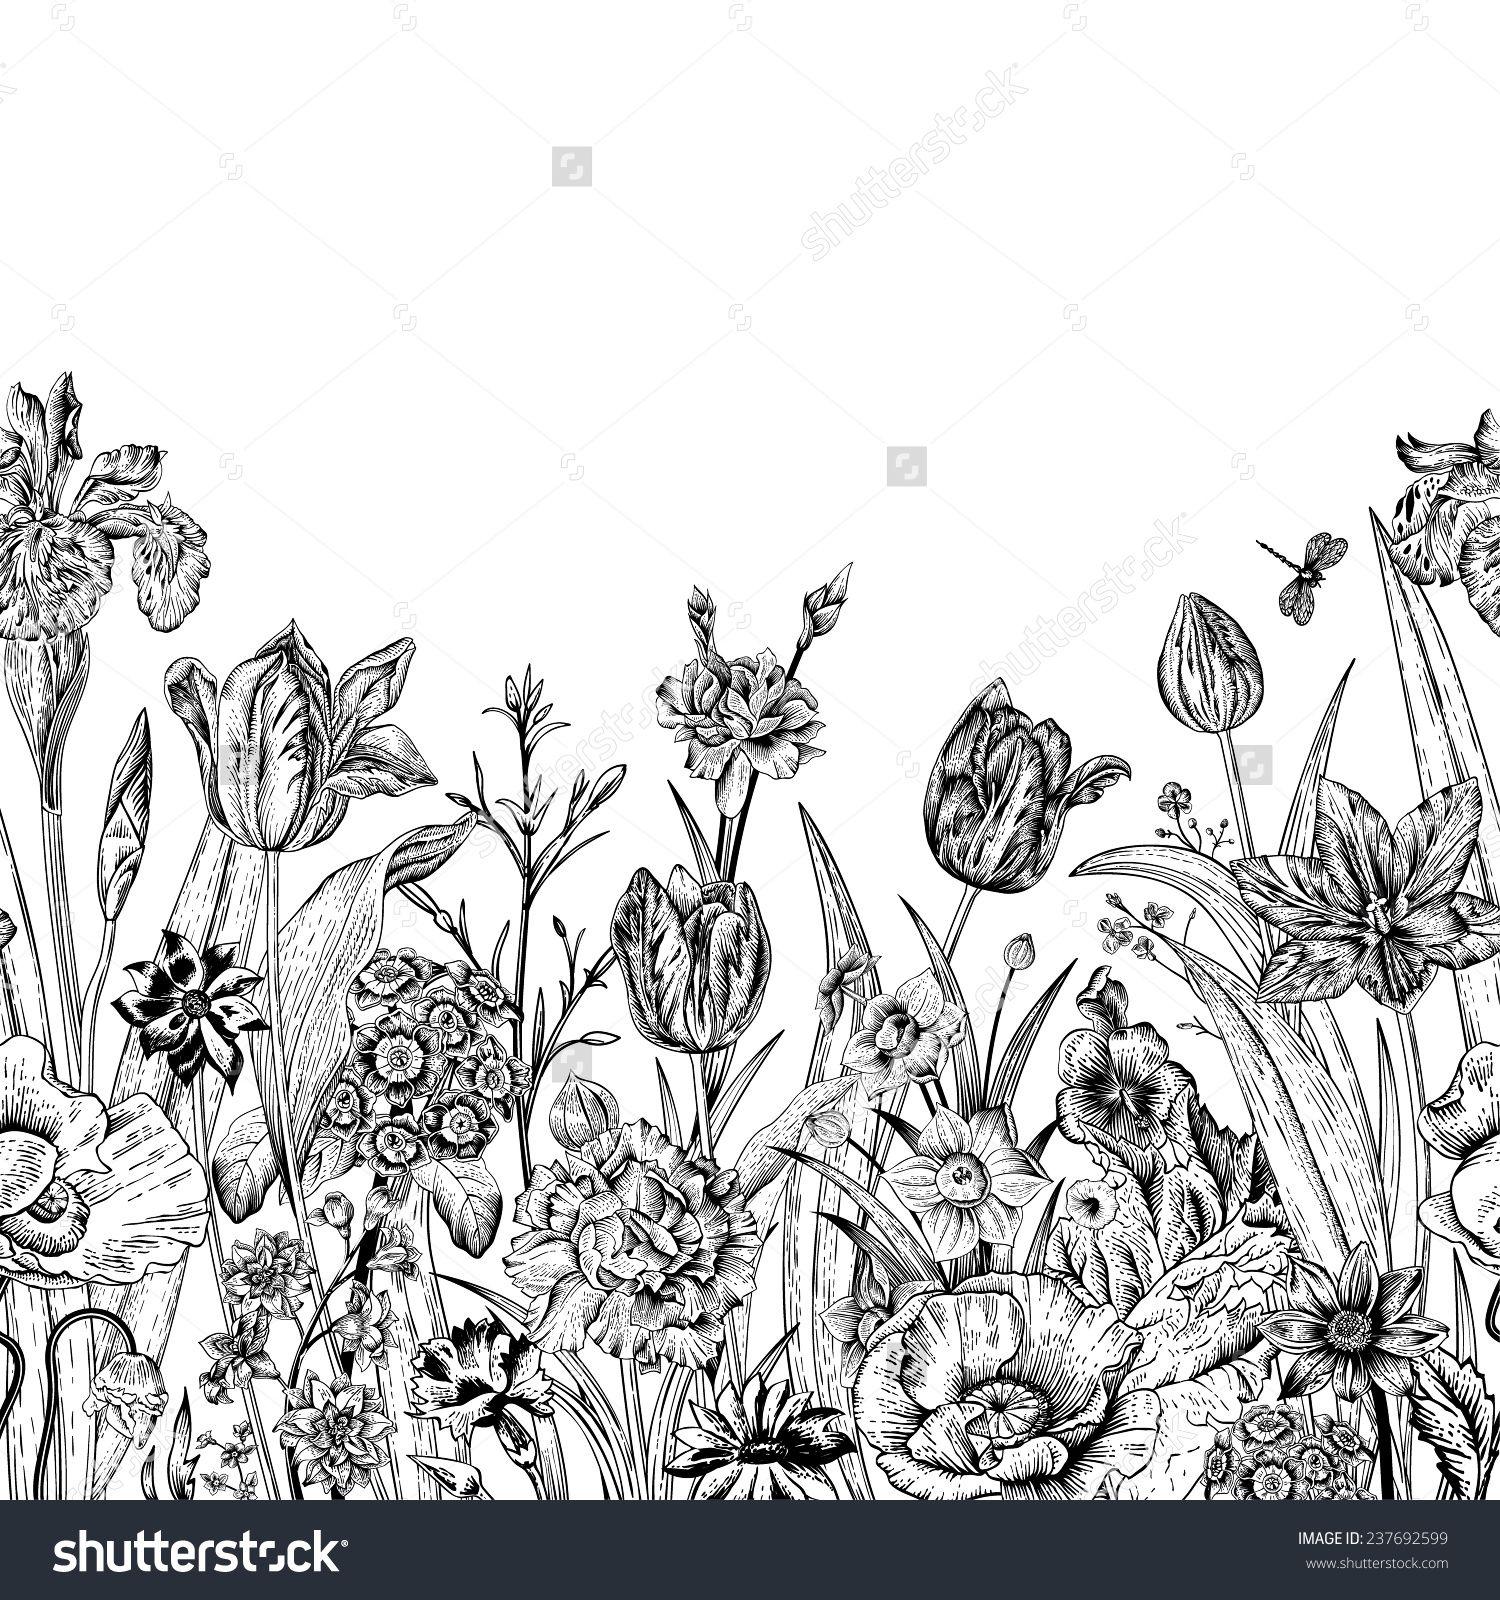 Spring Flowers Seamless Floral Border Poppies Iris Tulips Carnations Primroses